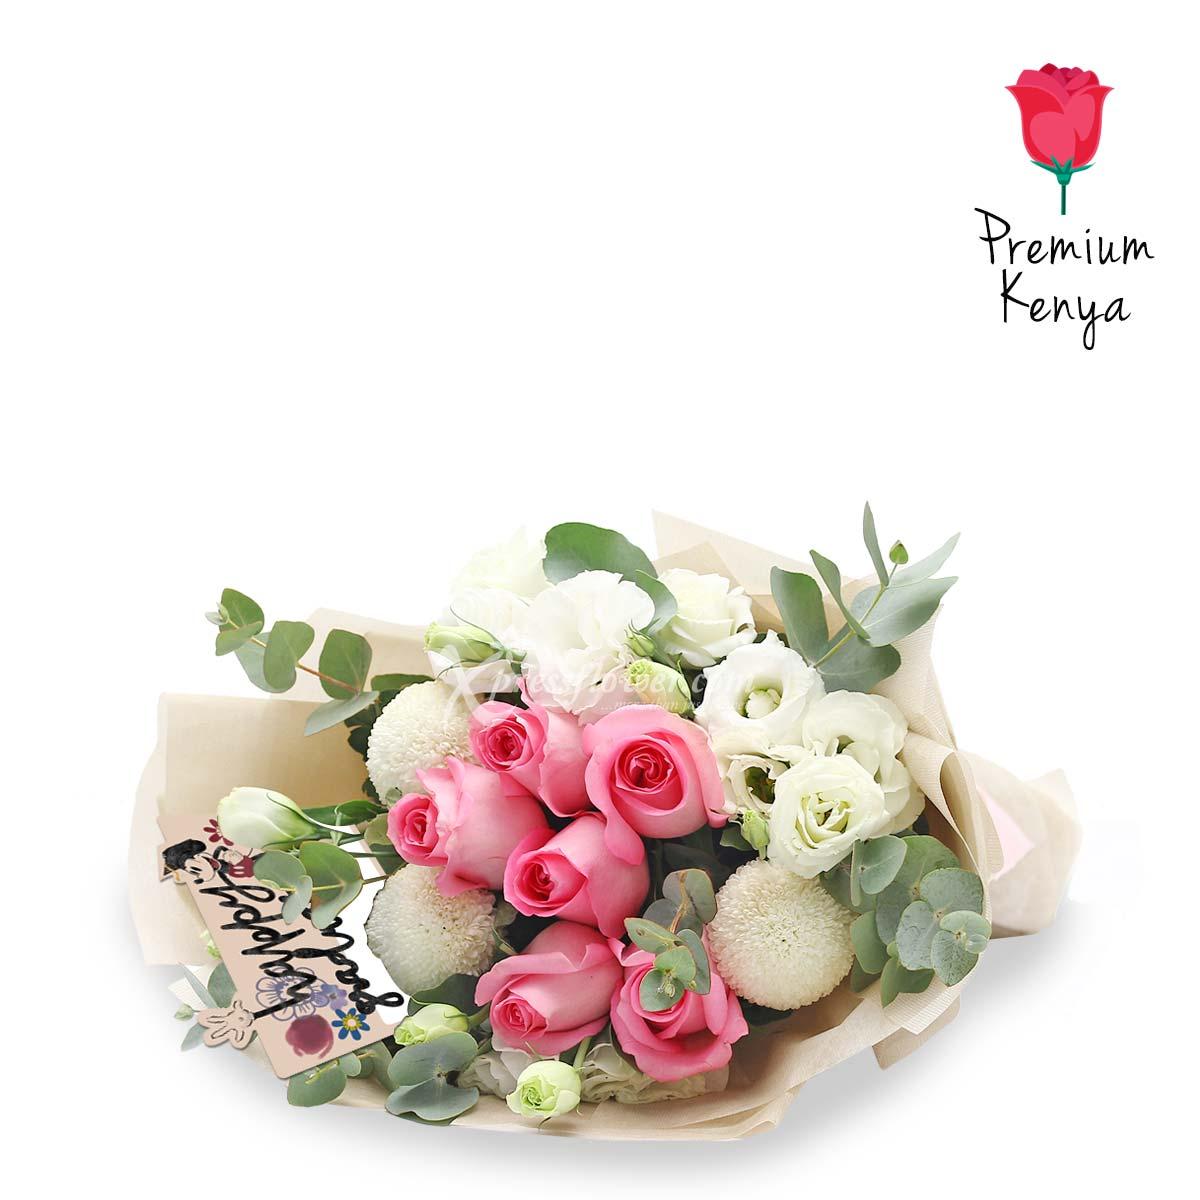 DSBQ1904 Cheerful Delight Disney bouquet